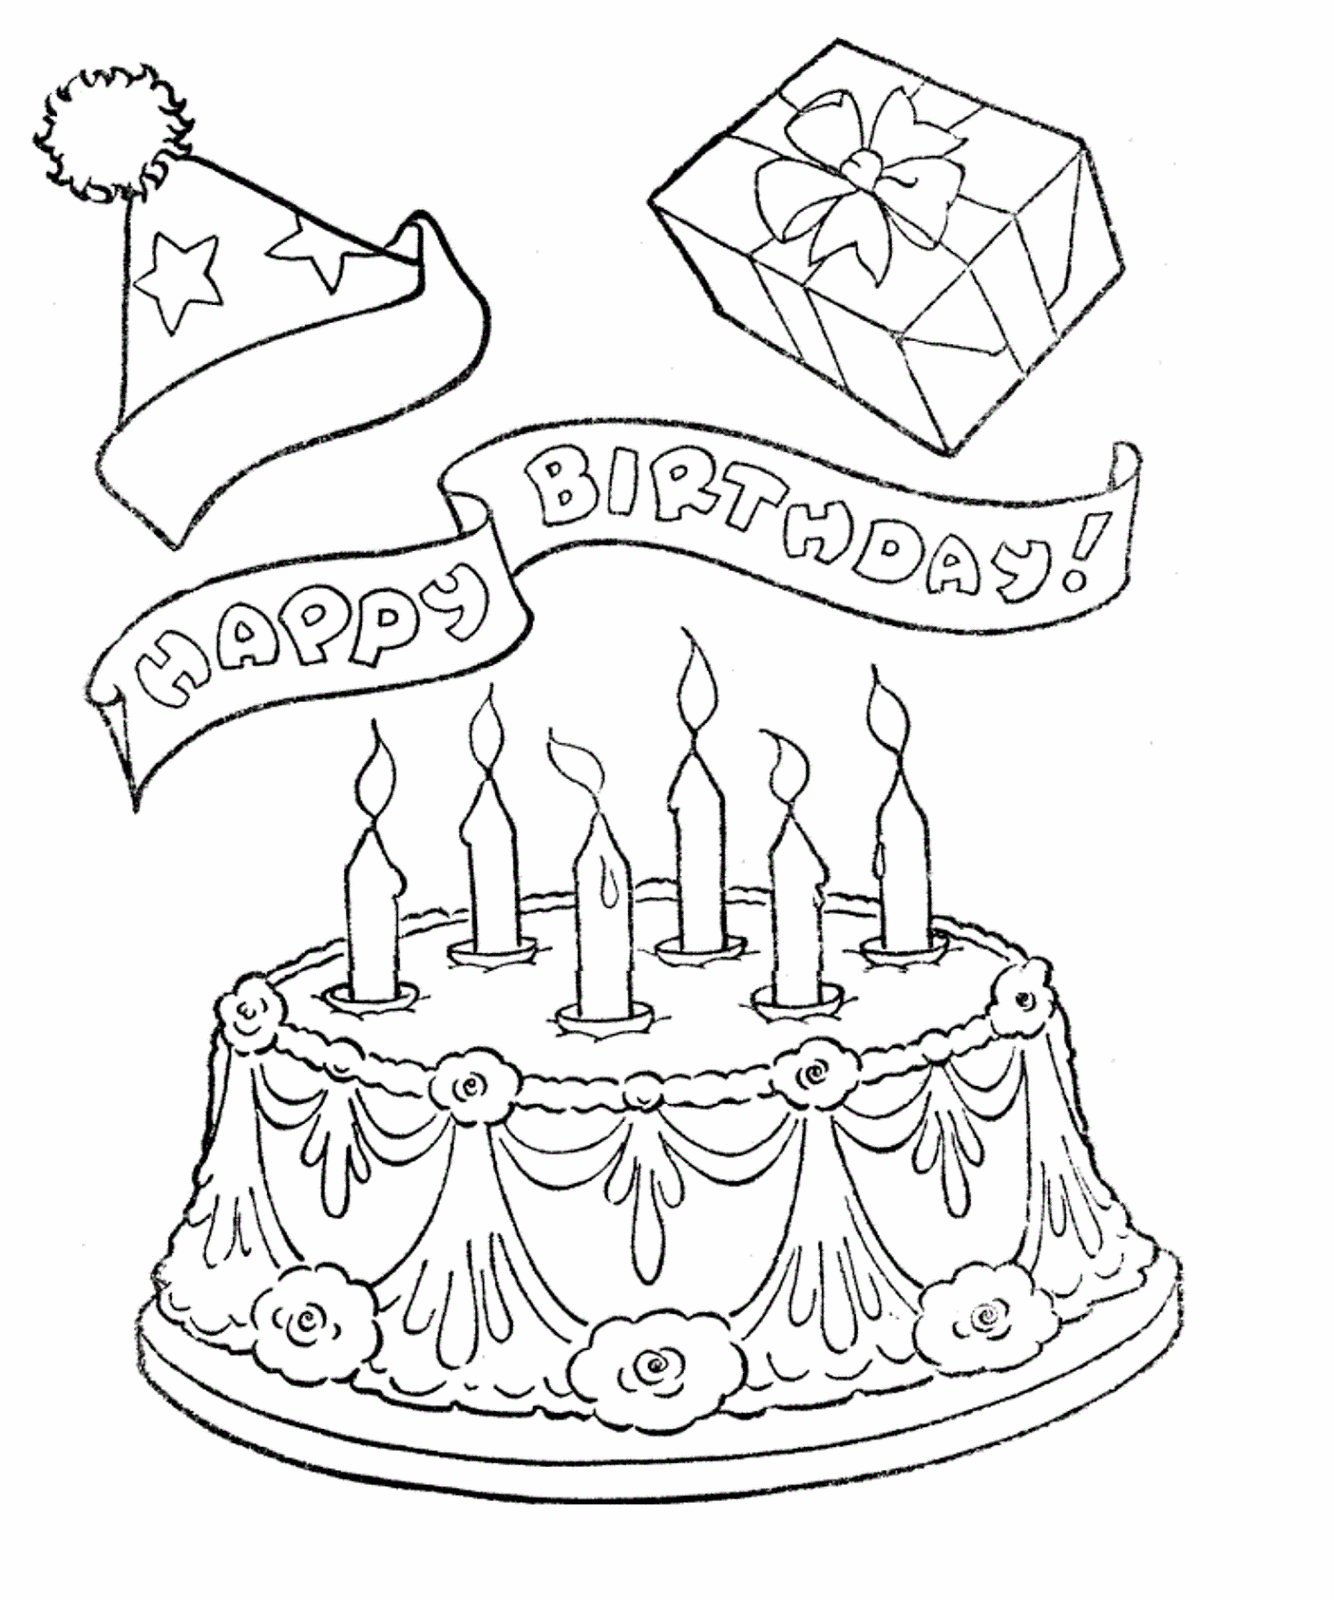 Gambar Mewarnai Kue Ulang Tahun 16